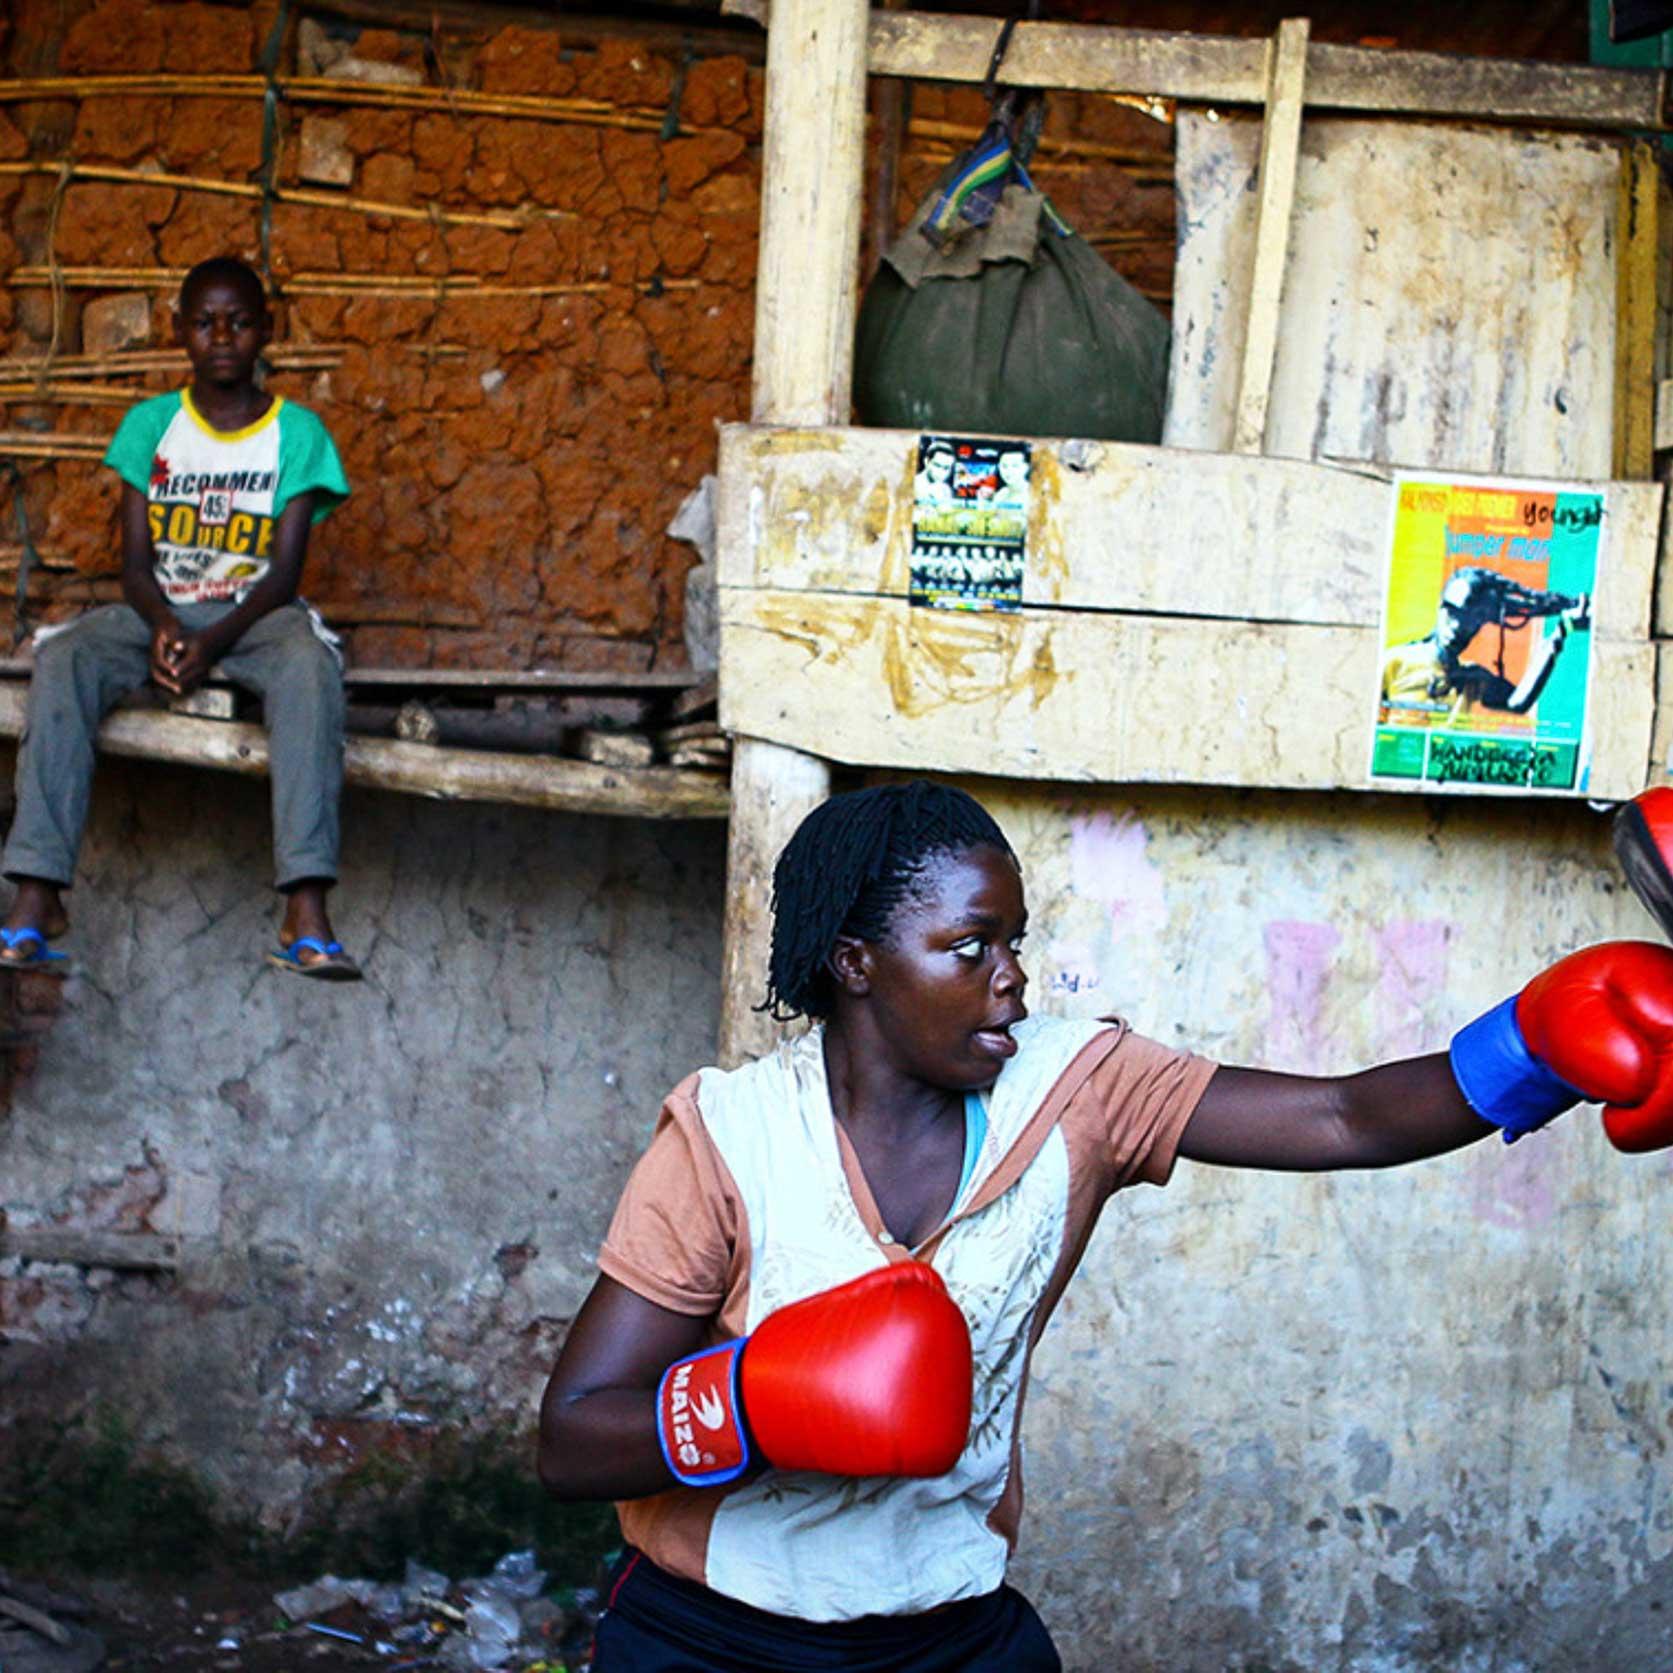 A female boxer trains inside a makeshift gym in Katanga, Kampala, Uganda.